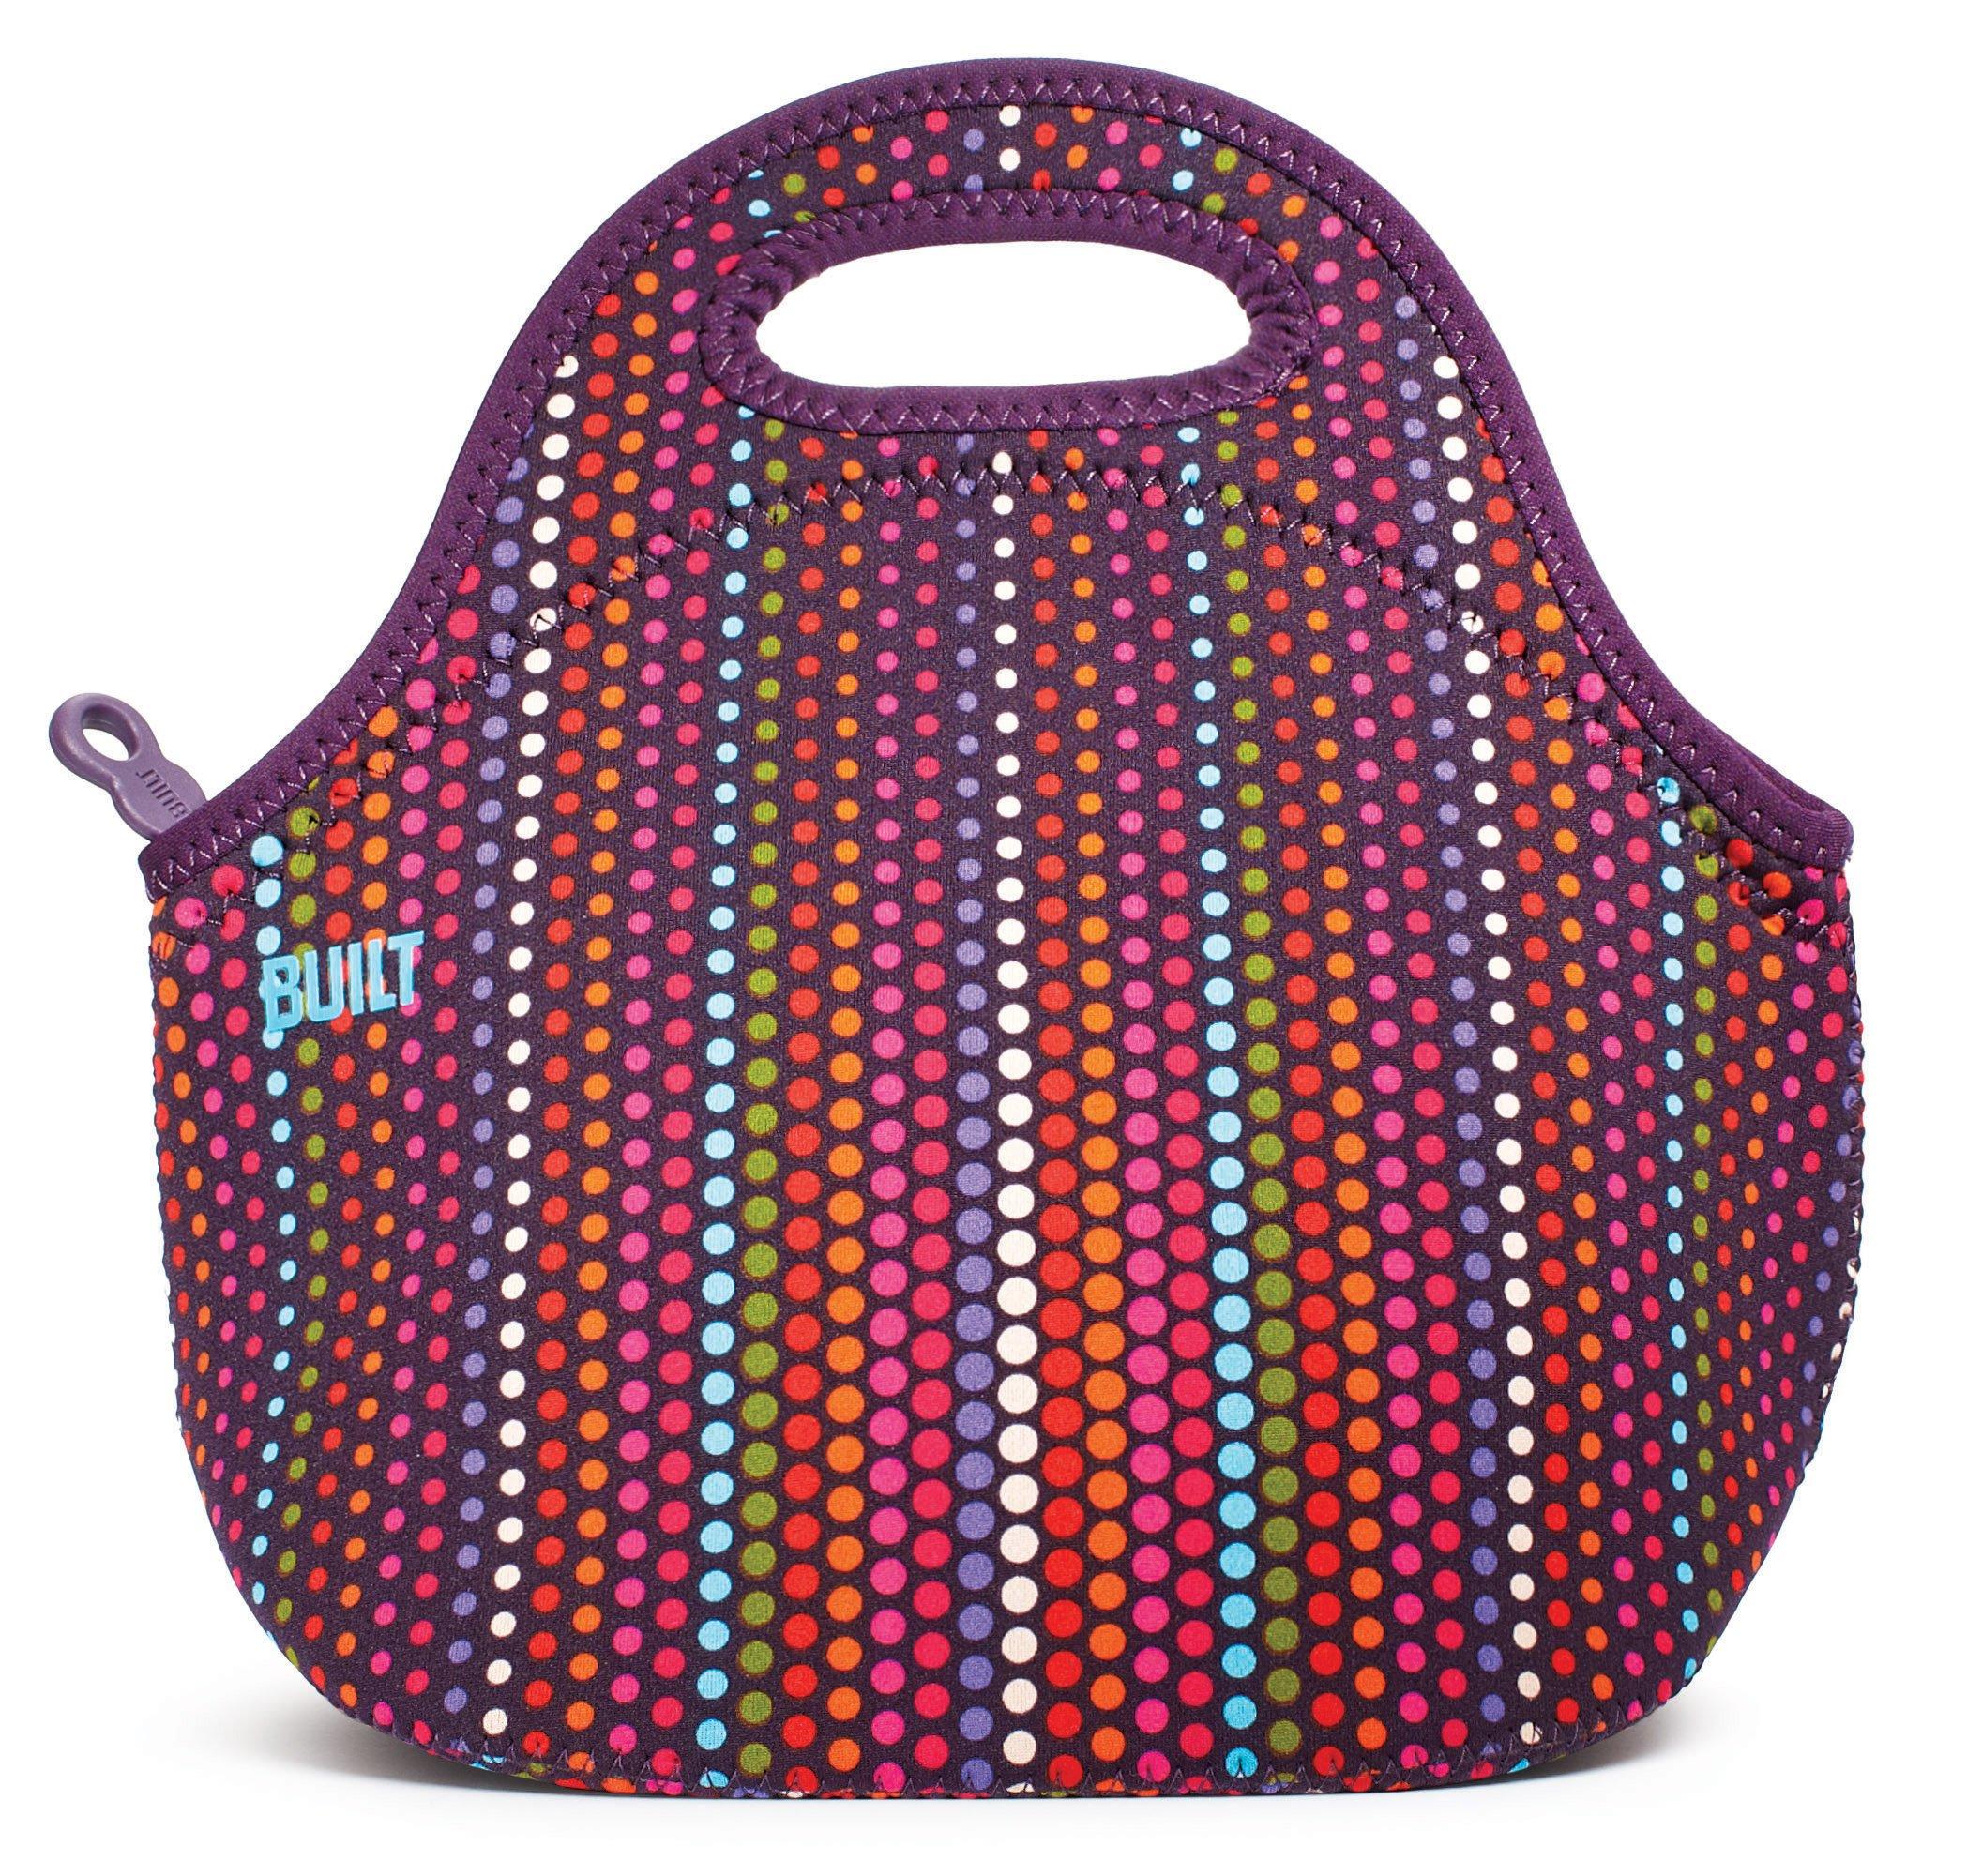 BUILT LB31-MDT Gourmet Getaway Soft Neoprene Lunch Tote Bag - Lightweight, Insulated and Reusable, Micro Dot